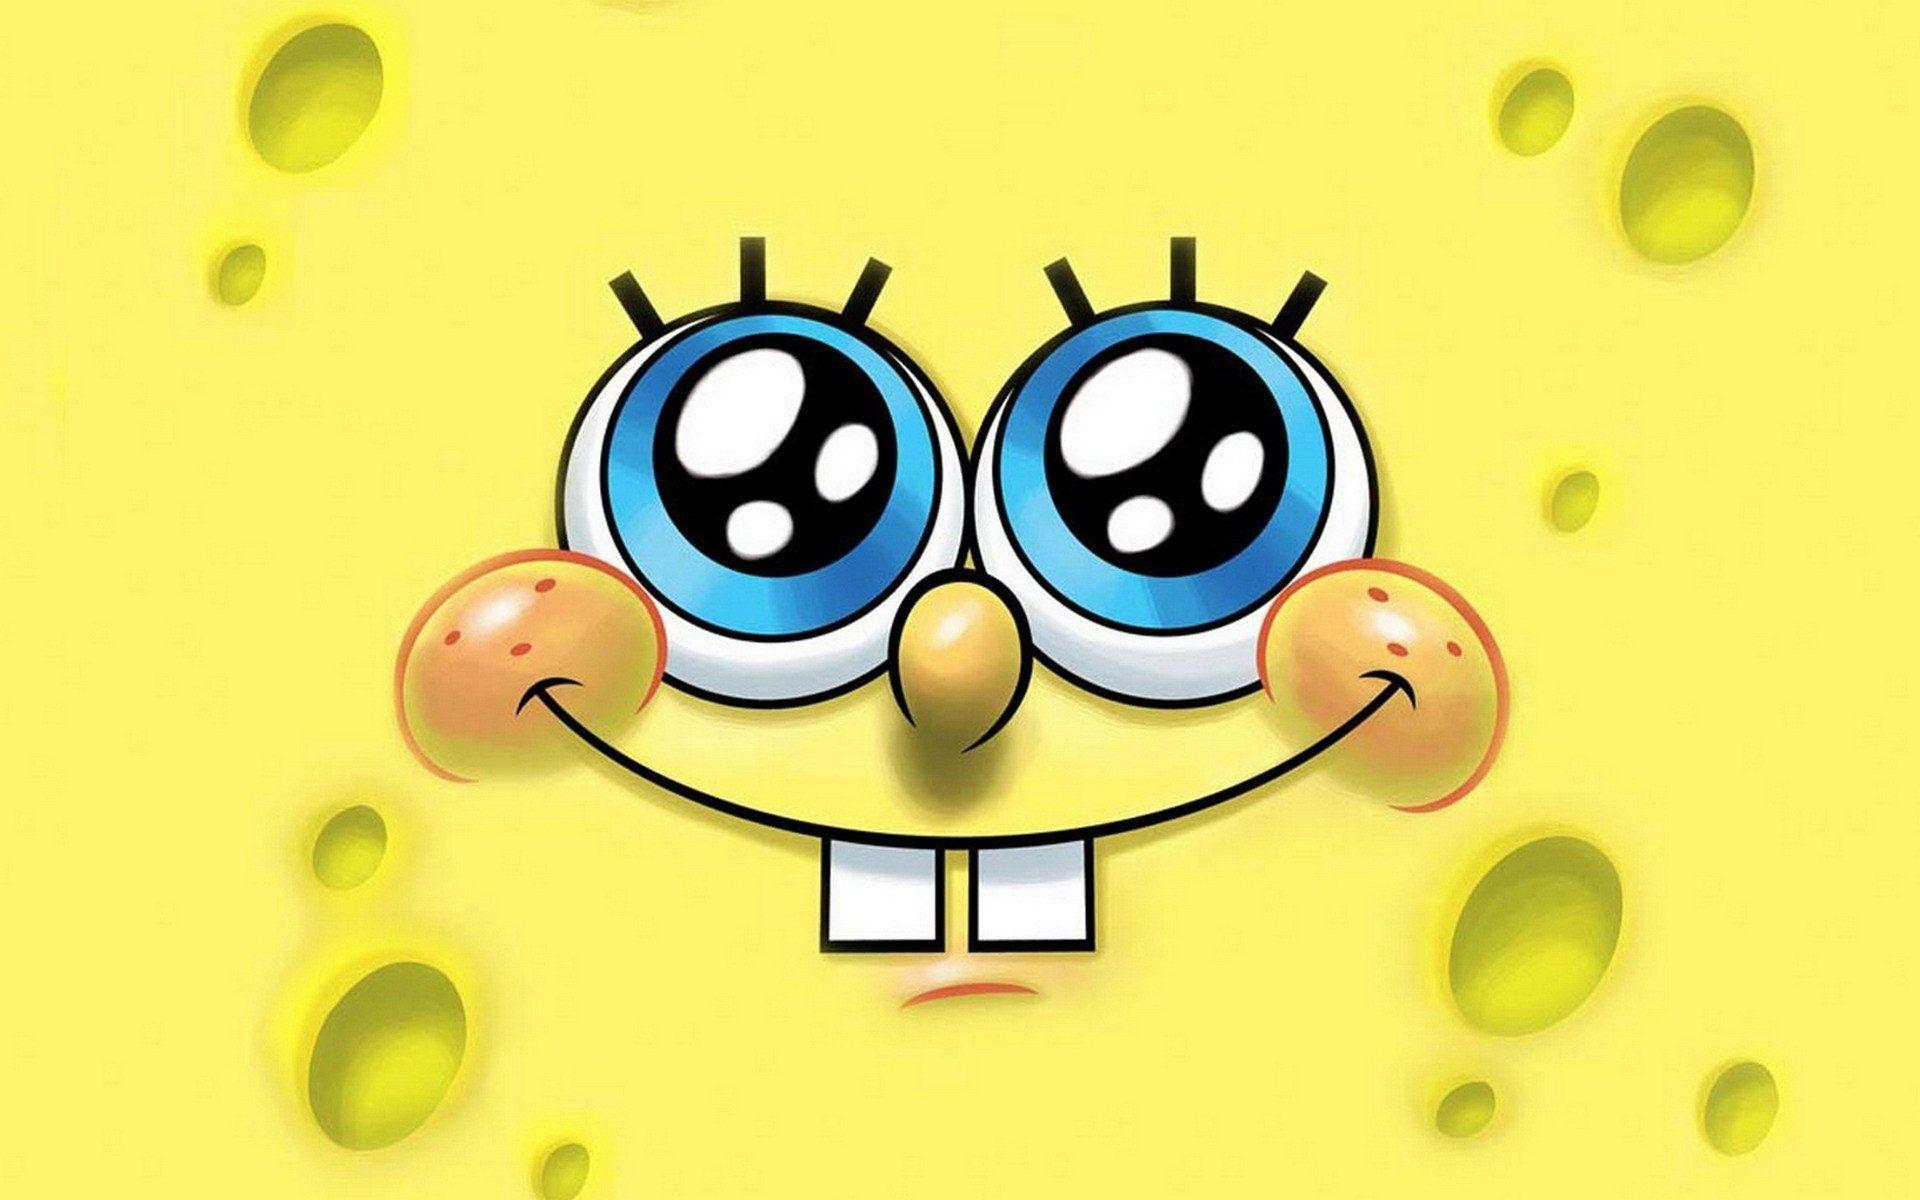 Spongebob Squarepants Background for Your Computer